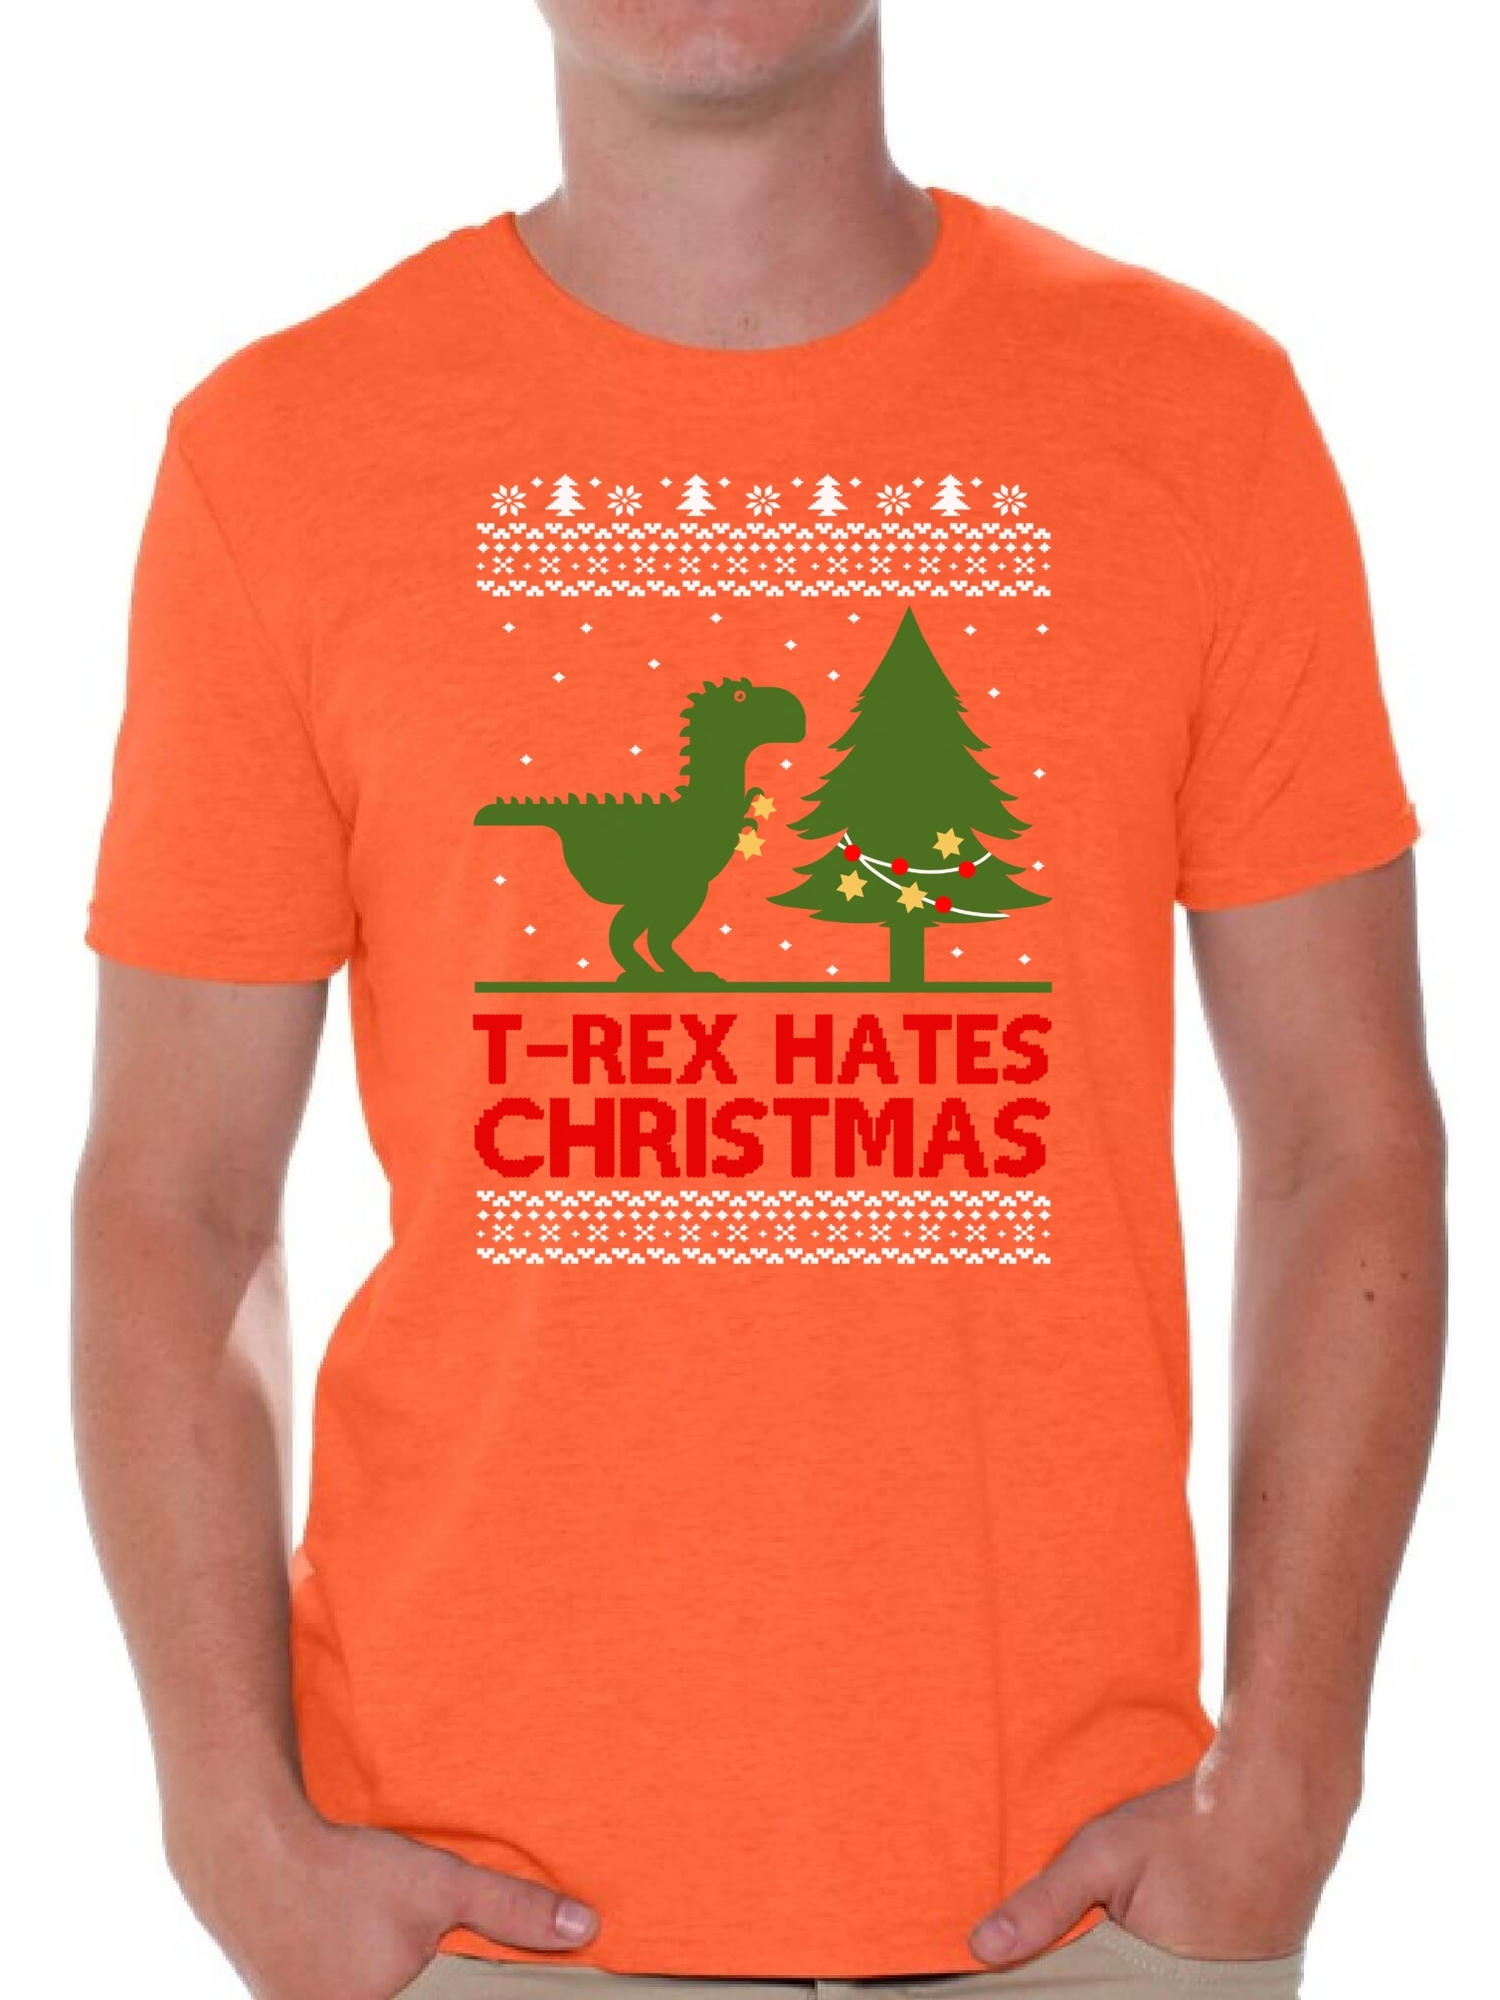 7b1304278 Awkward Styles T-Rex Hates Christmas Shirt Christmas Tshirts for Men T Rex  Christmas Dinosaur Shirt Dinosaur T-Rex Ugly Christmas t-shirt Funny Tacky  Party ...